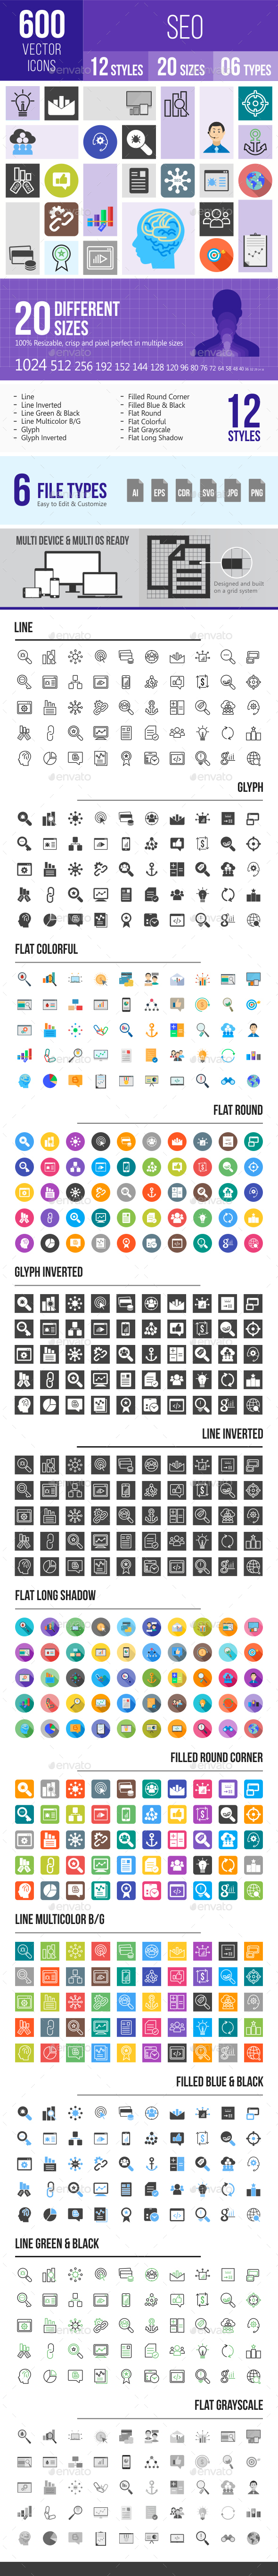 600 SEO Icons - Icons